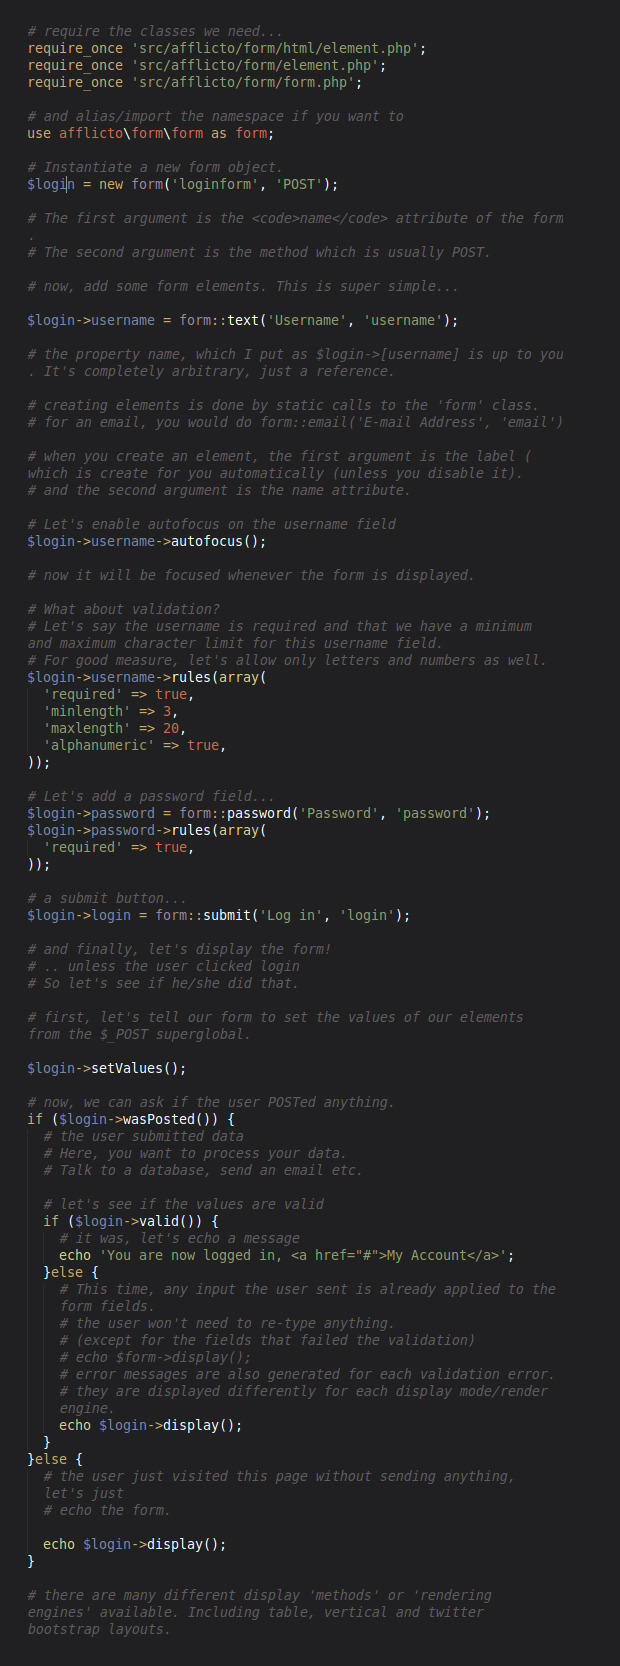 Form class ajax validation jquery bootstrap by gentlefoxmedia addrenderingengineg ajaxg bootstrapg deadsimpleg doesnotforceg inlinepreviewg kubeframeworkg falaconquin